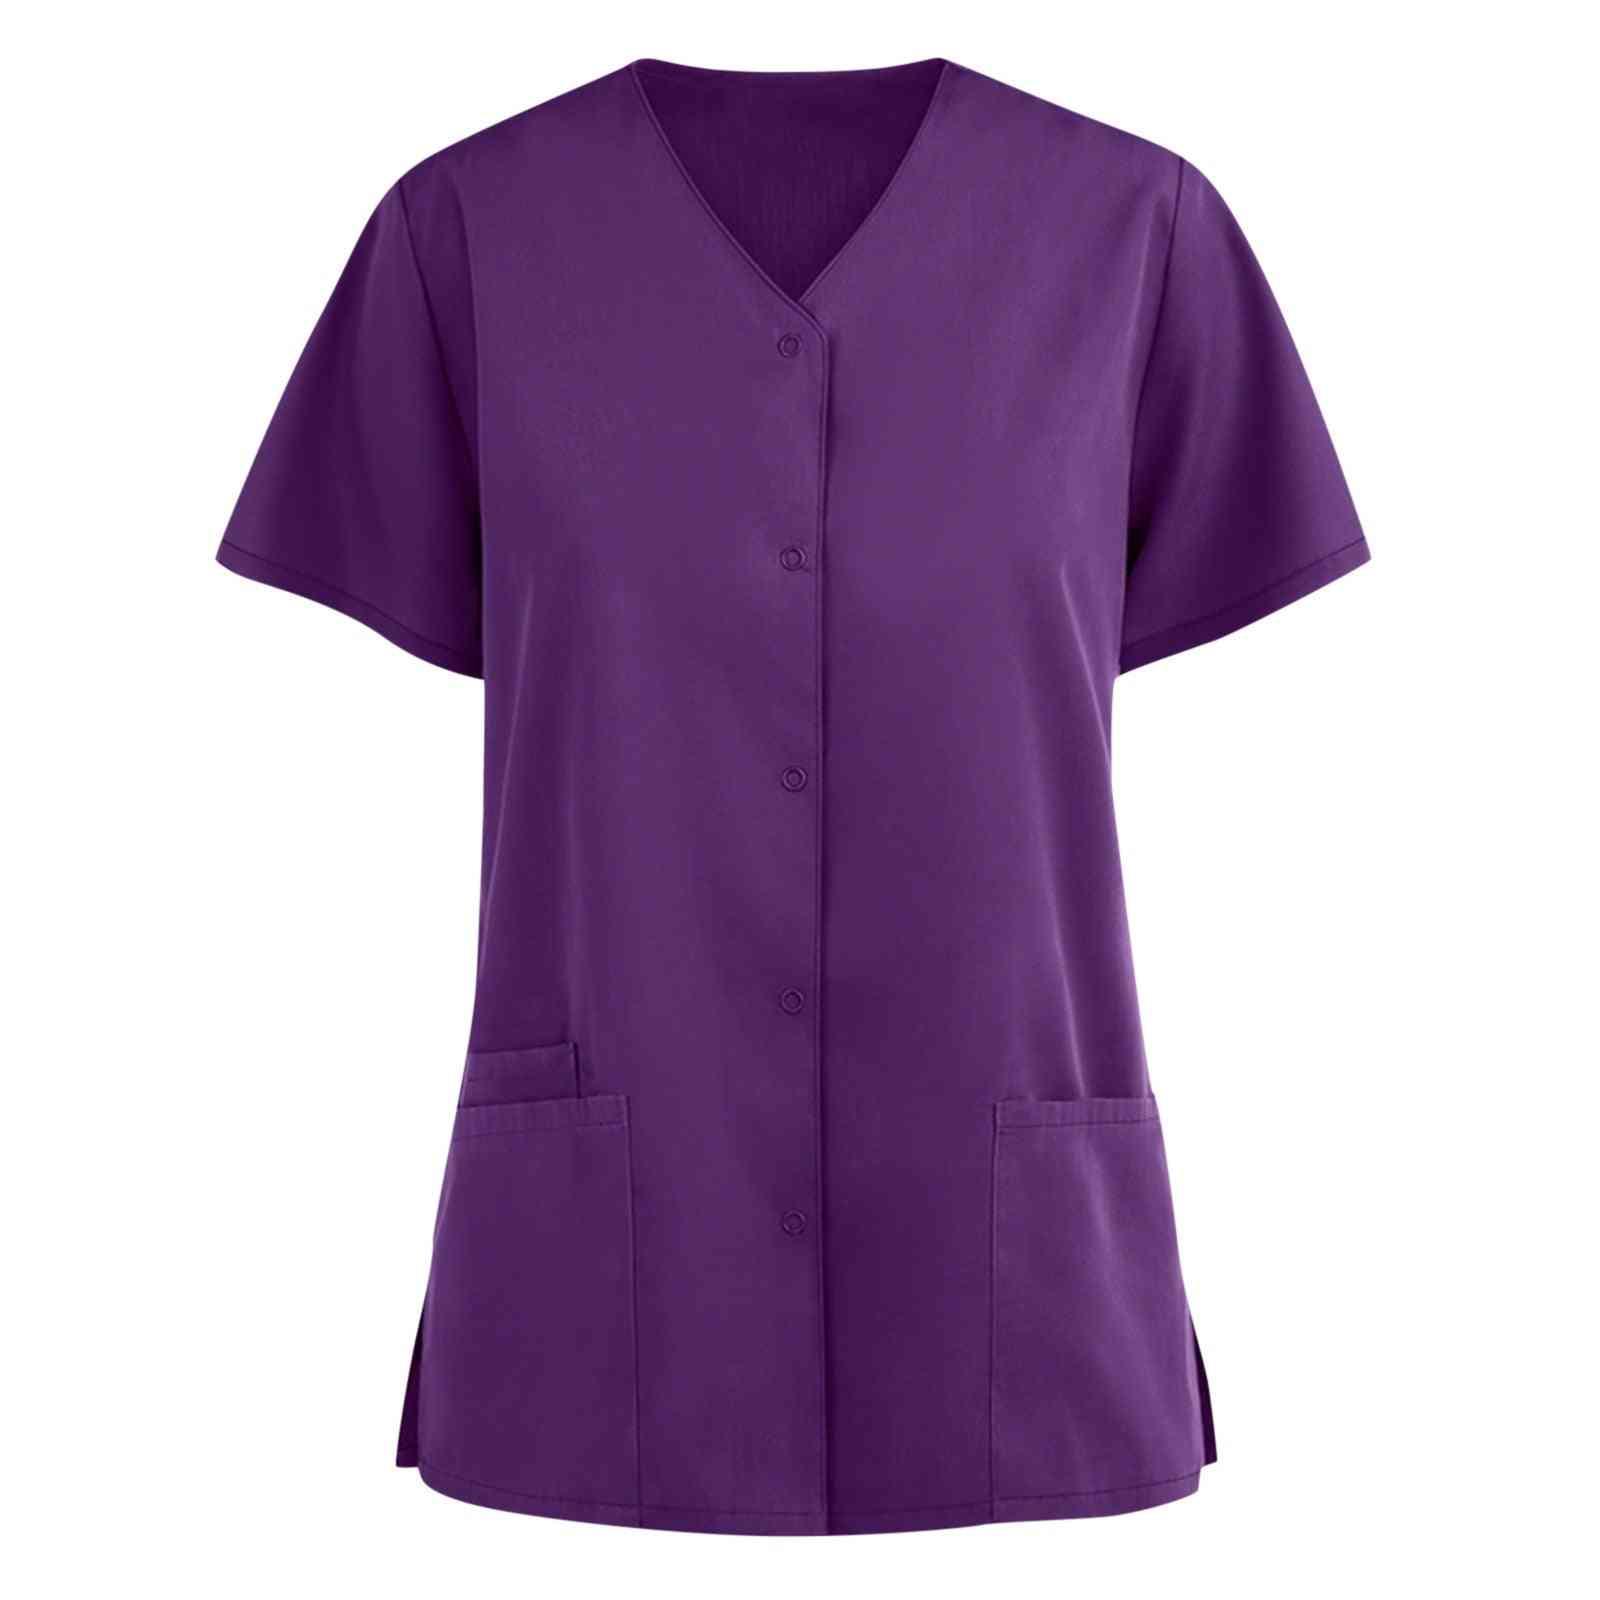 Women's Blouse Clothing Soild Short Sleeve V-neck Care Workers Shirt Top